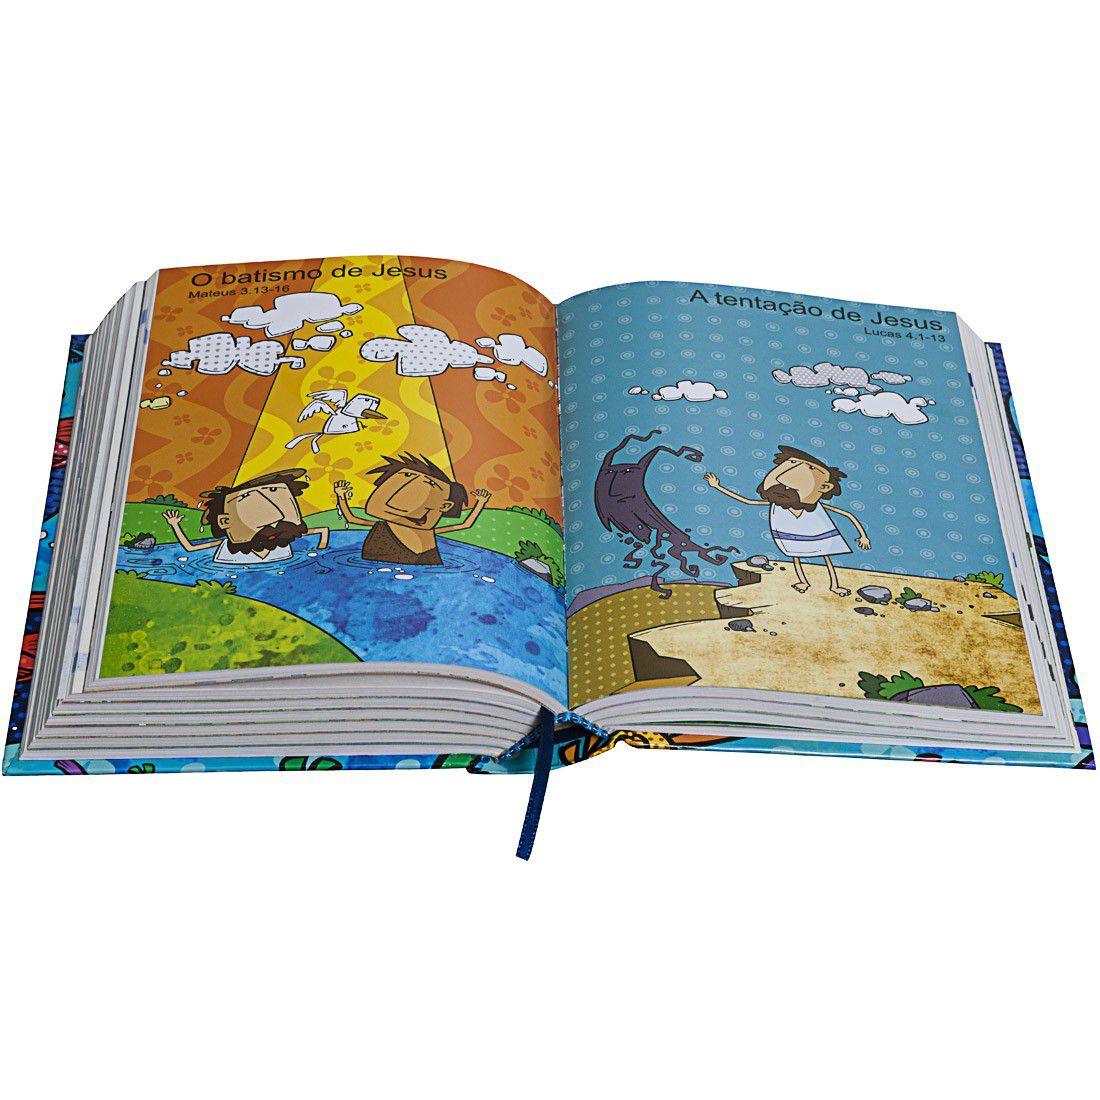 Bíblia Sagrada Palavra da Vida NTLH  - Livraria Betel